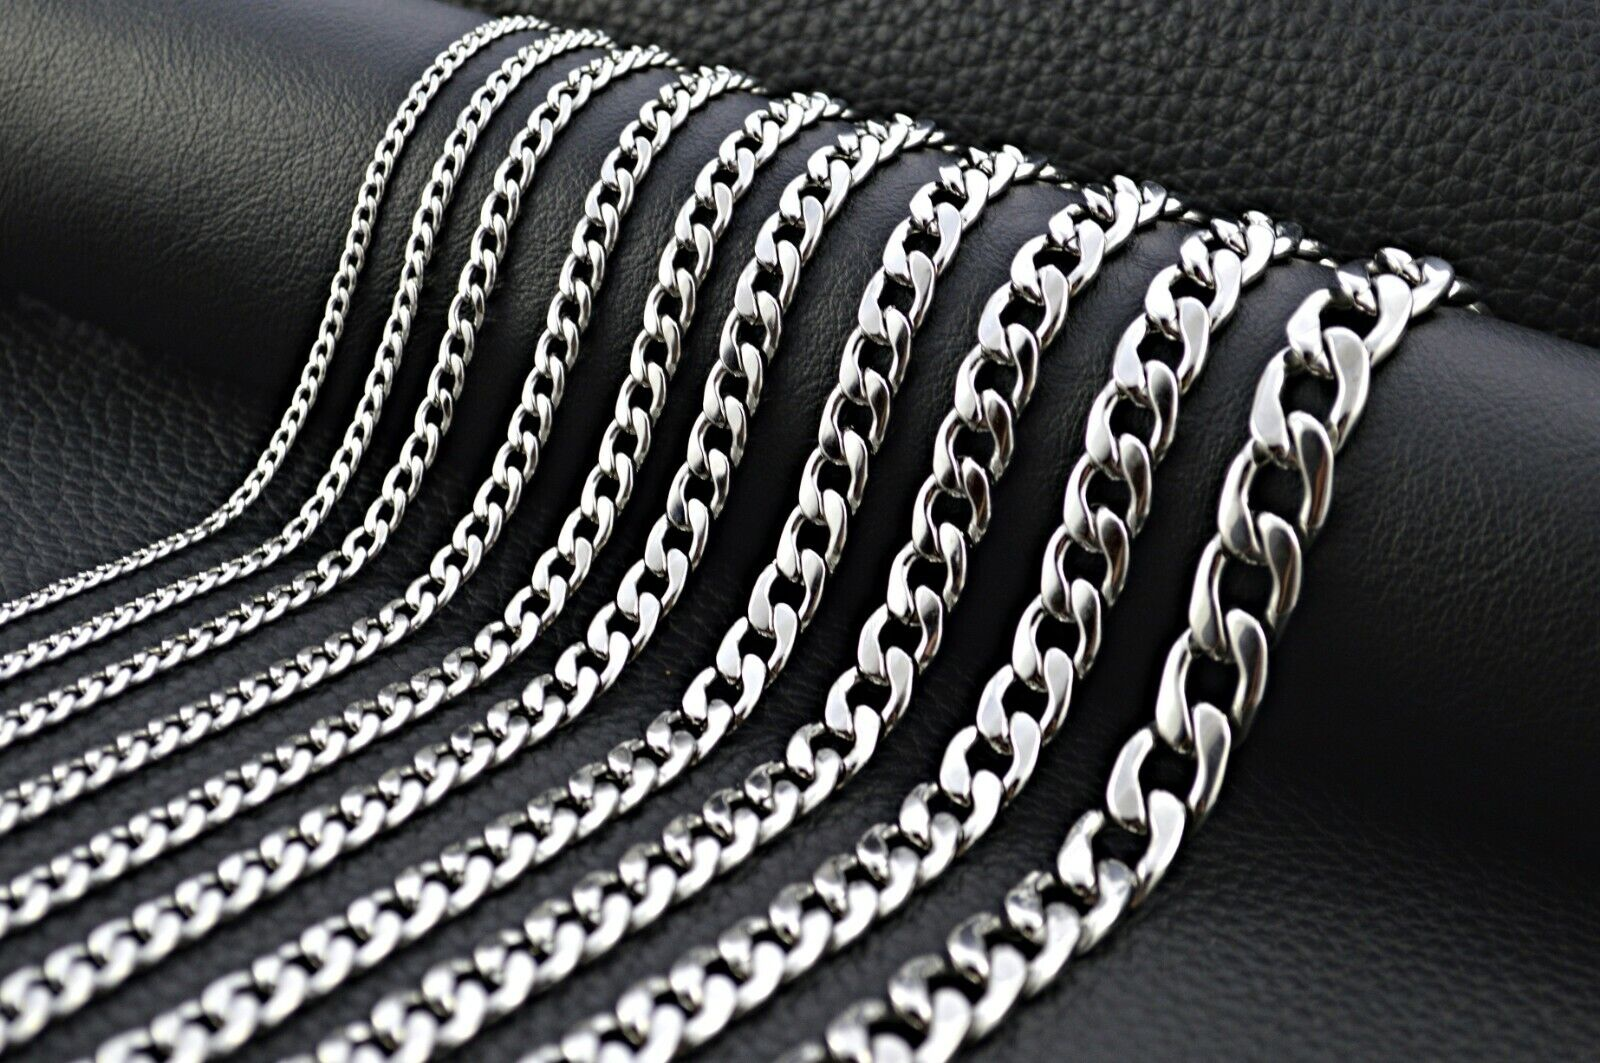 Edelstahlkette Panzerkette Halskette Silber Herren Damen Modeschmuck